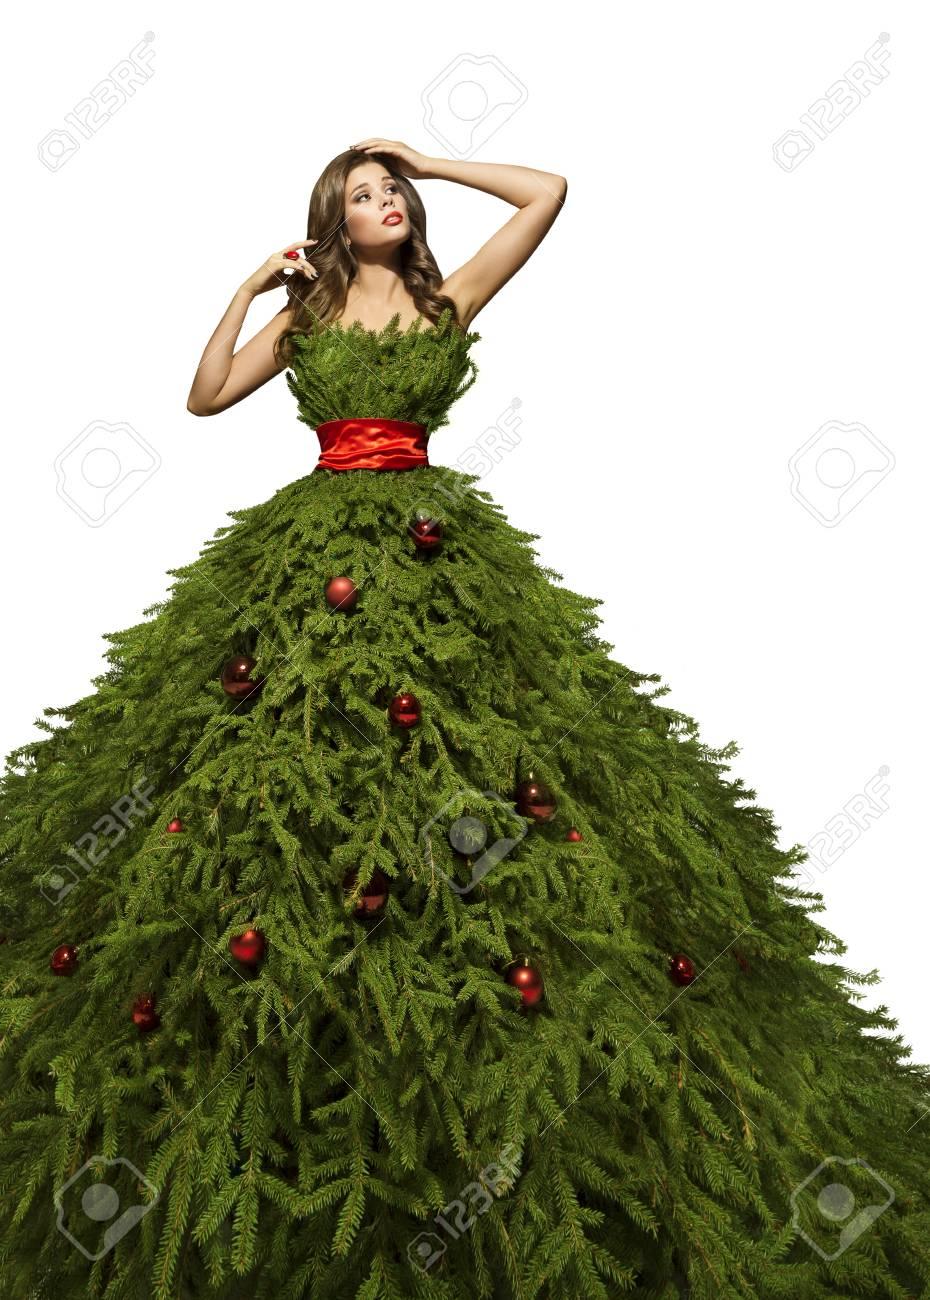 Christmas Tree Dress Woman Posing In Xmas Fashion Model Gown